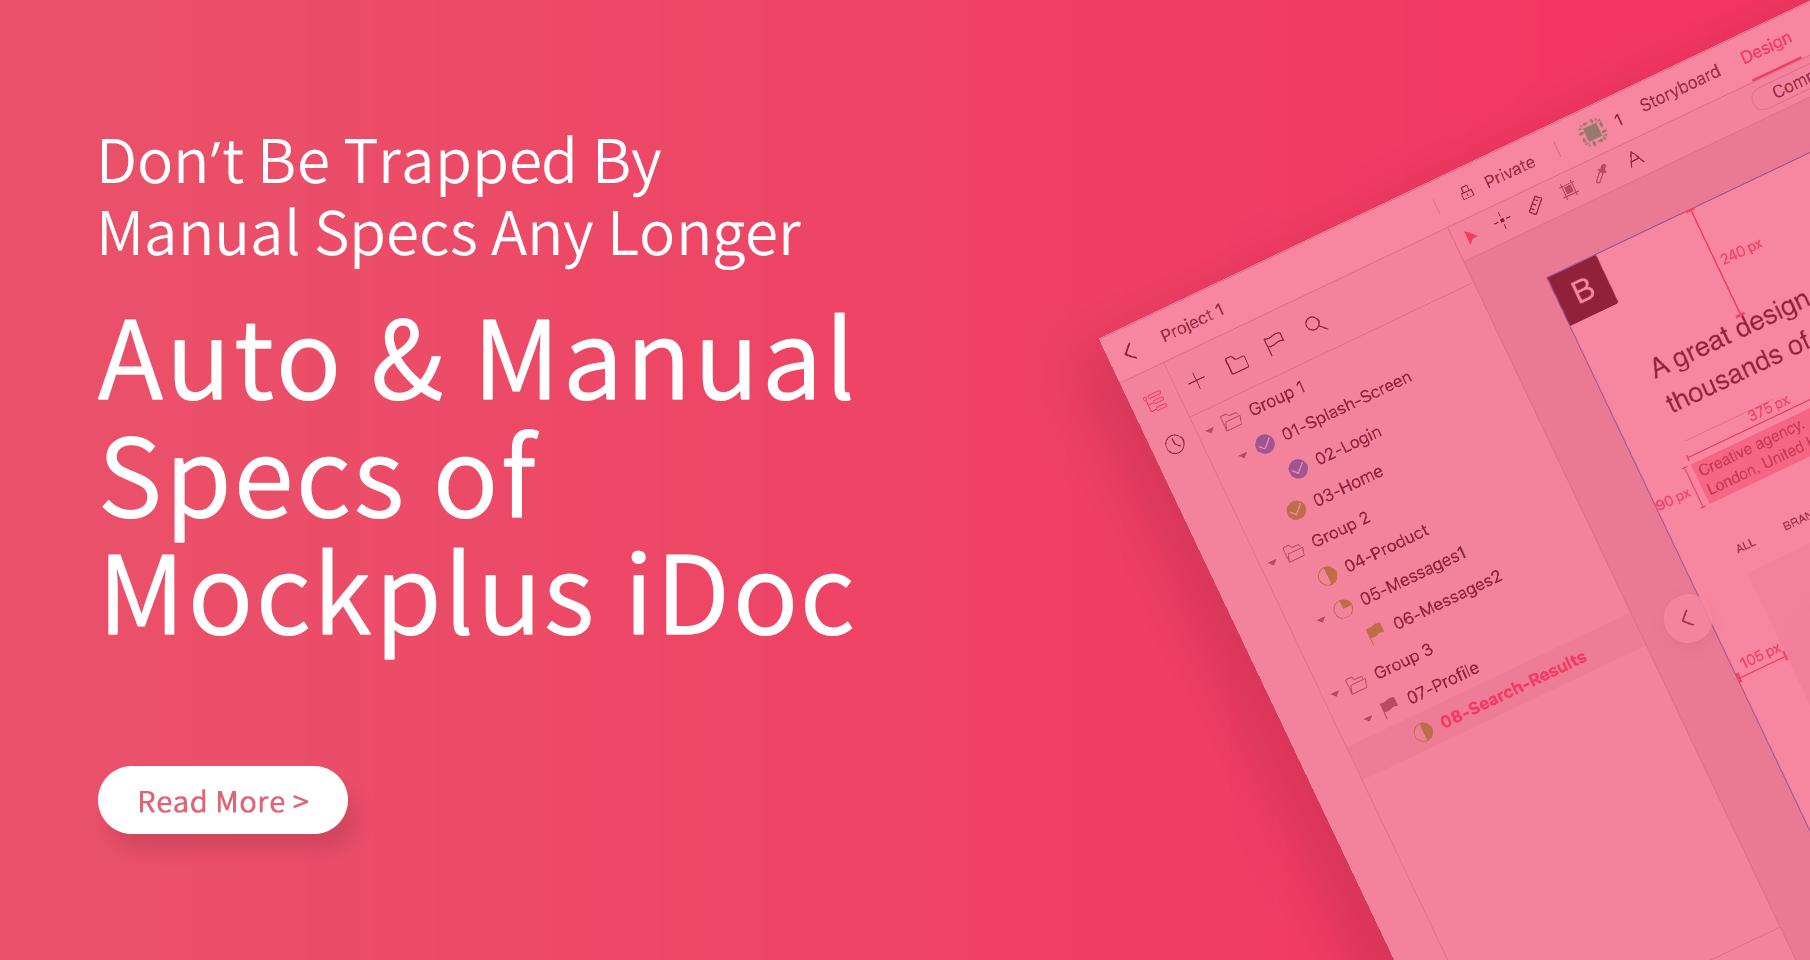 Auto & Manual Specs: Handoff Designs With No More Fuss in Mockplus iDoc